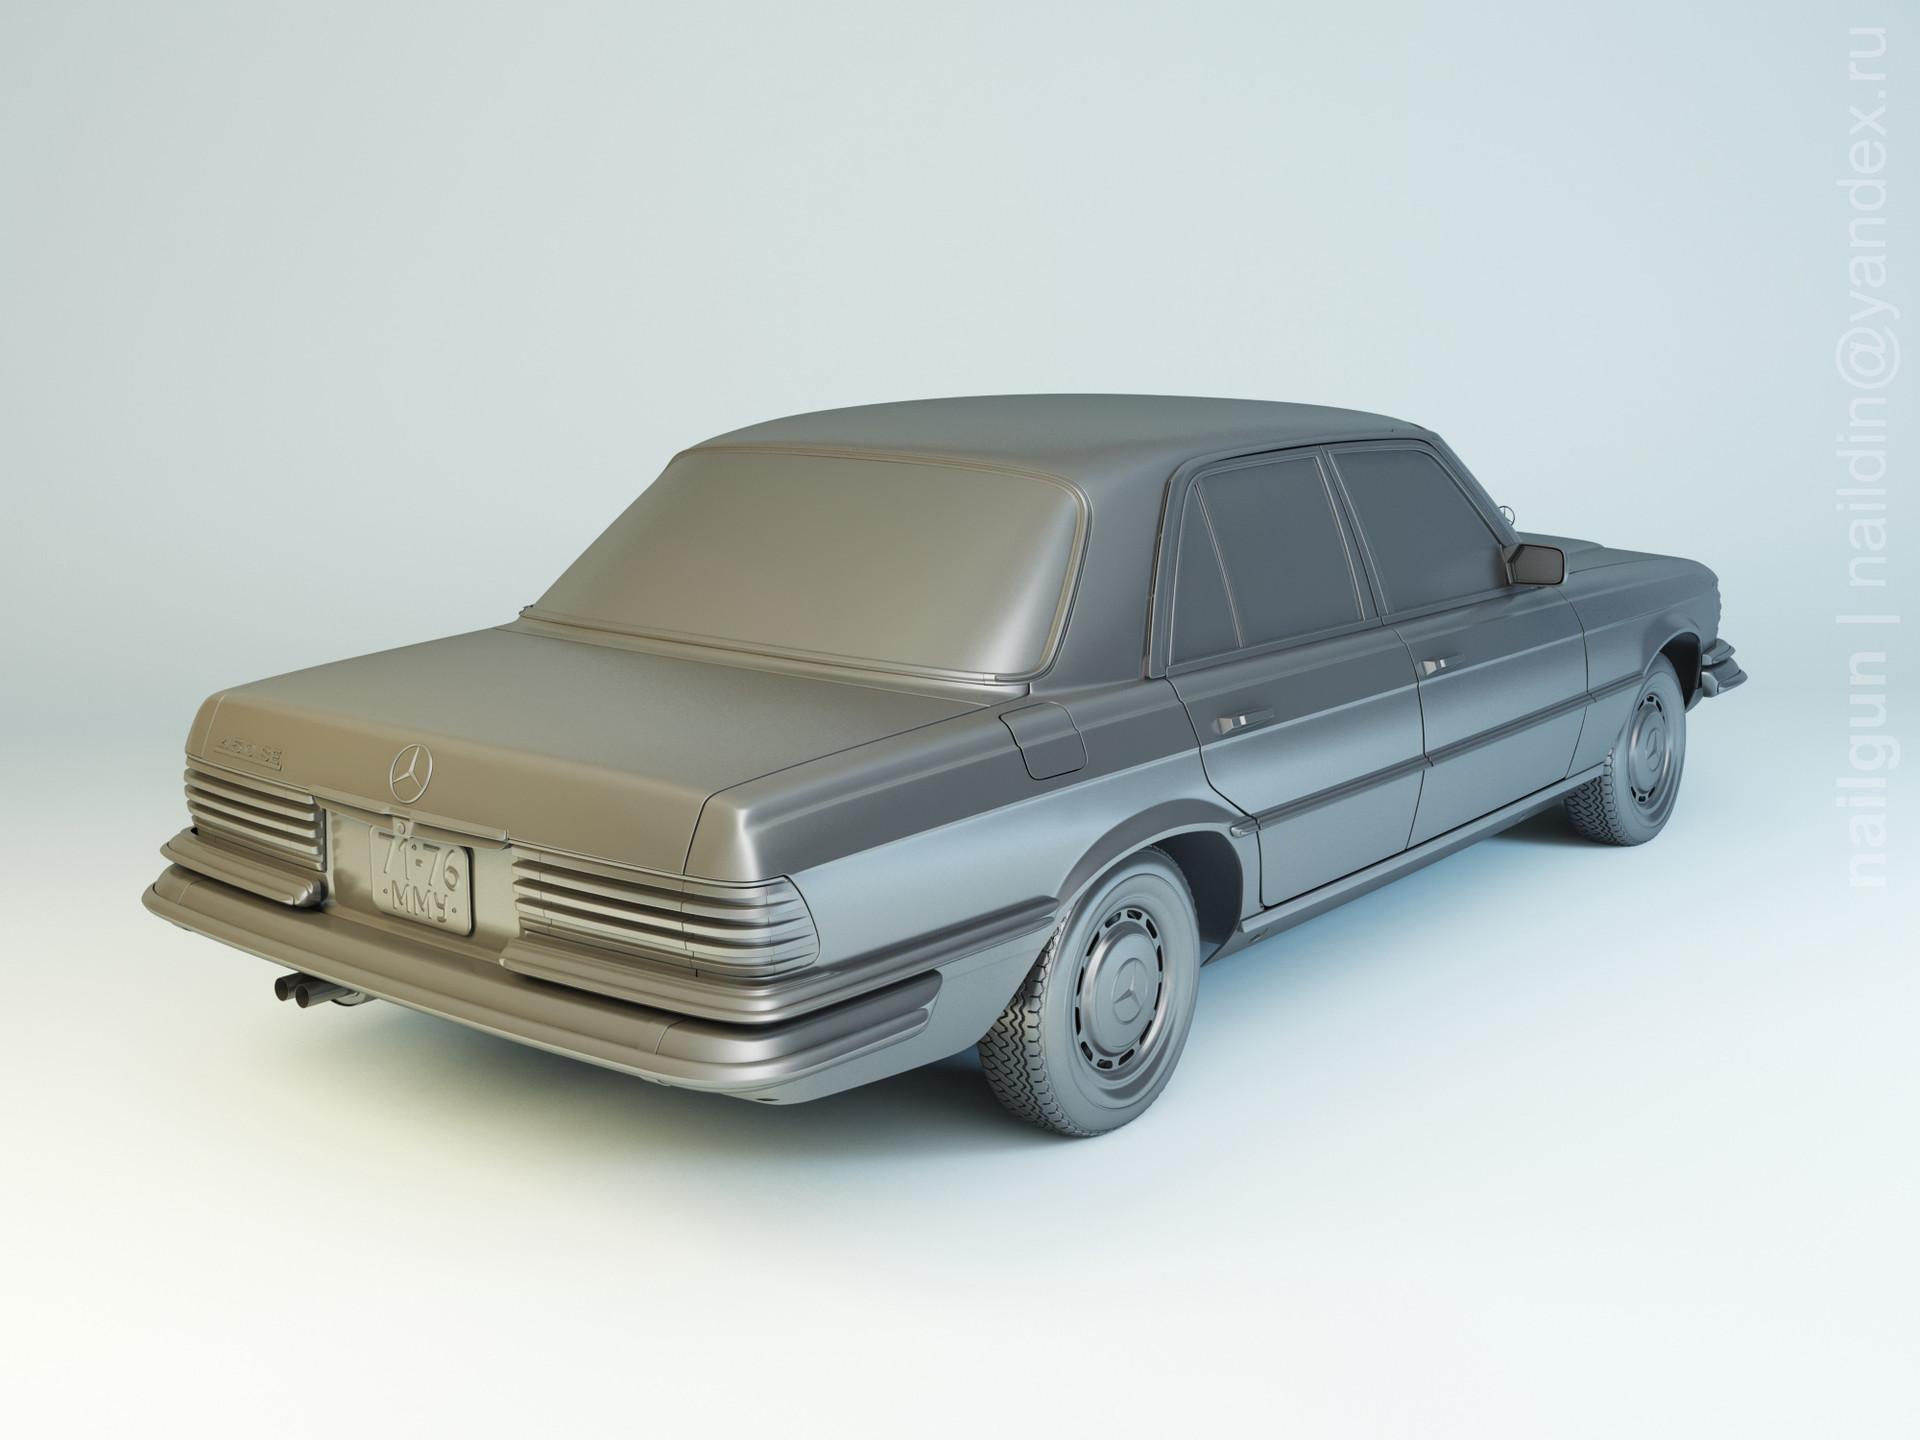 Nail khusnutdinov pwc 022 004 mercedes w116 modelling 1